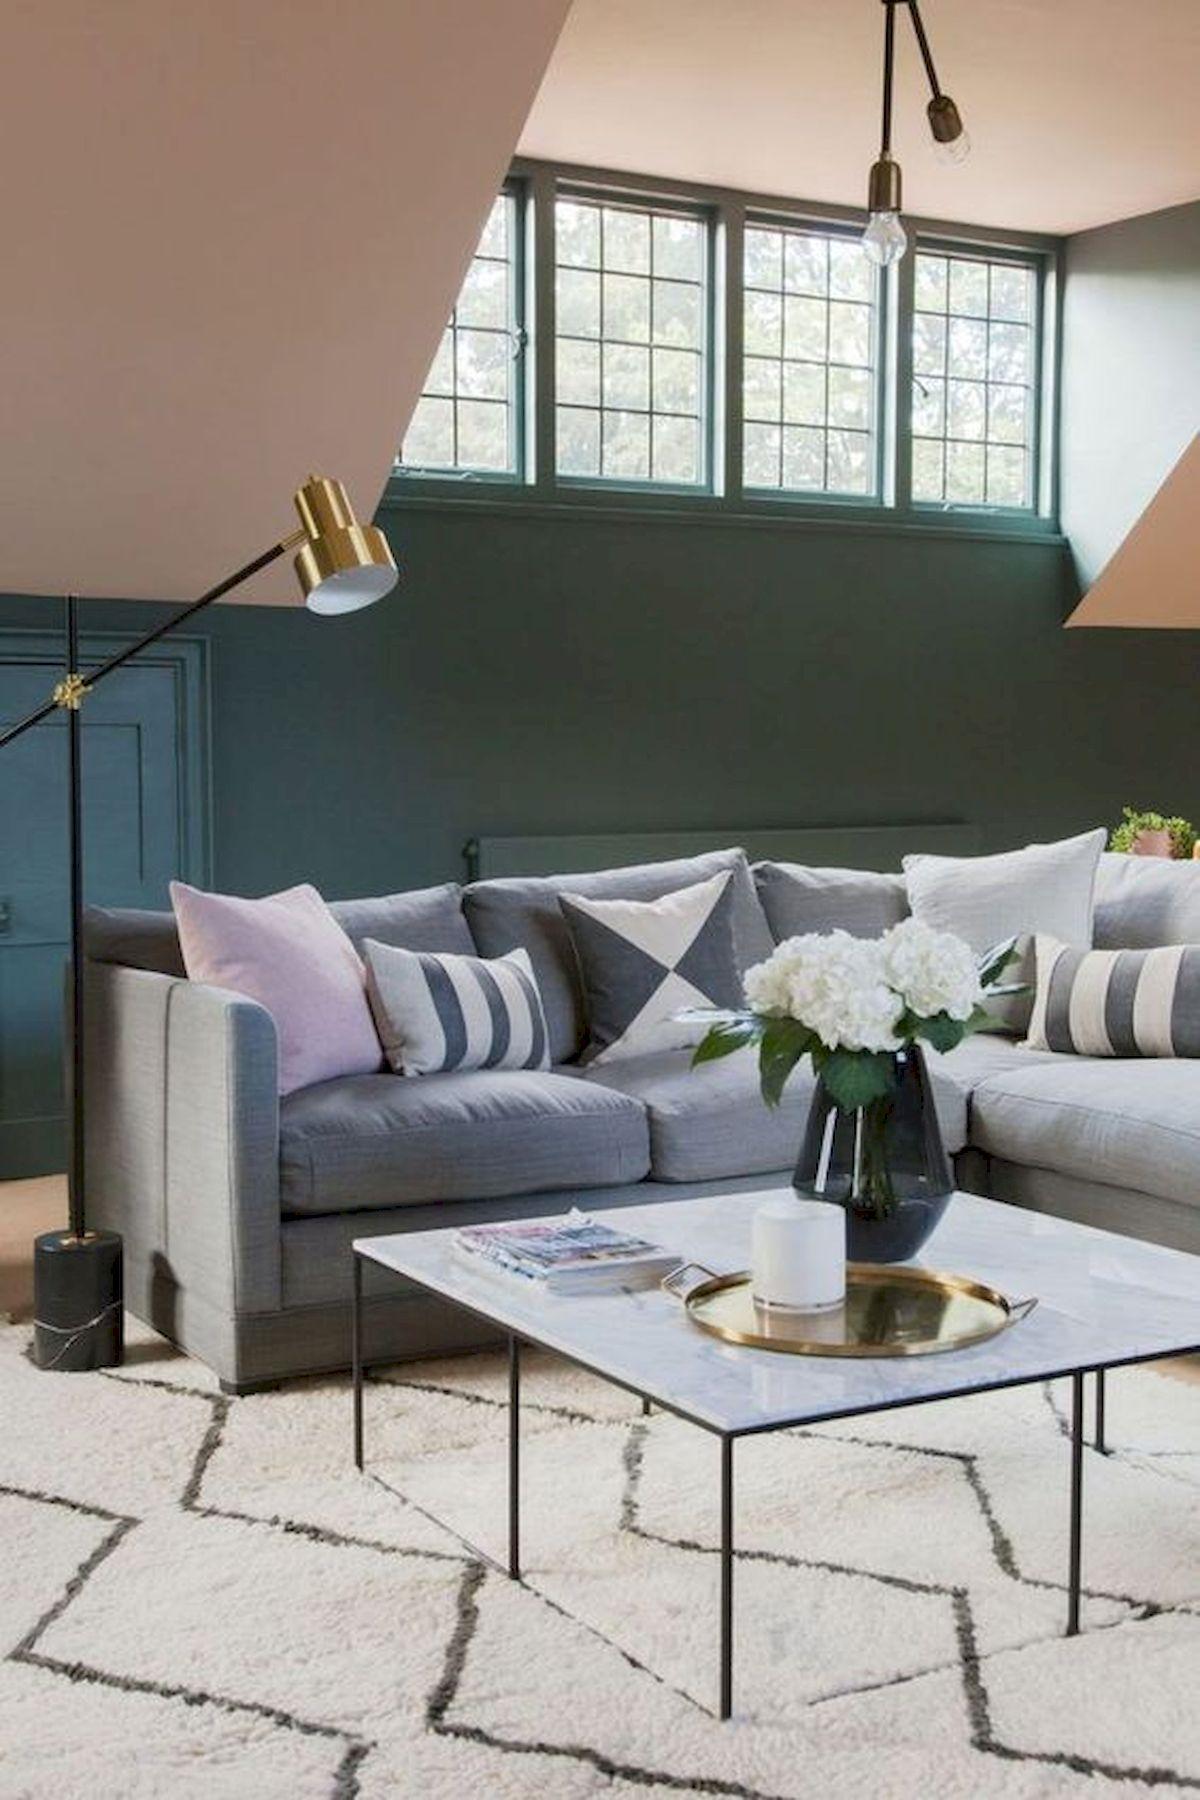 45 Brilliant DIY Living Room Design And Decor Ideas For Small Apartment (21)